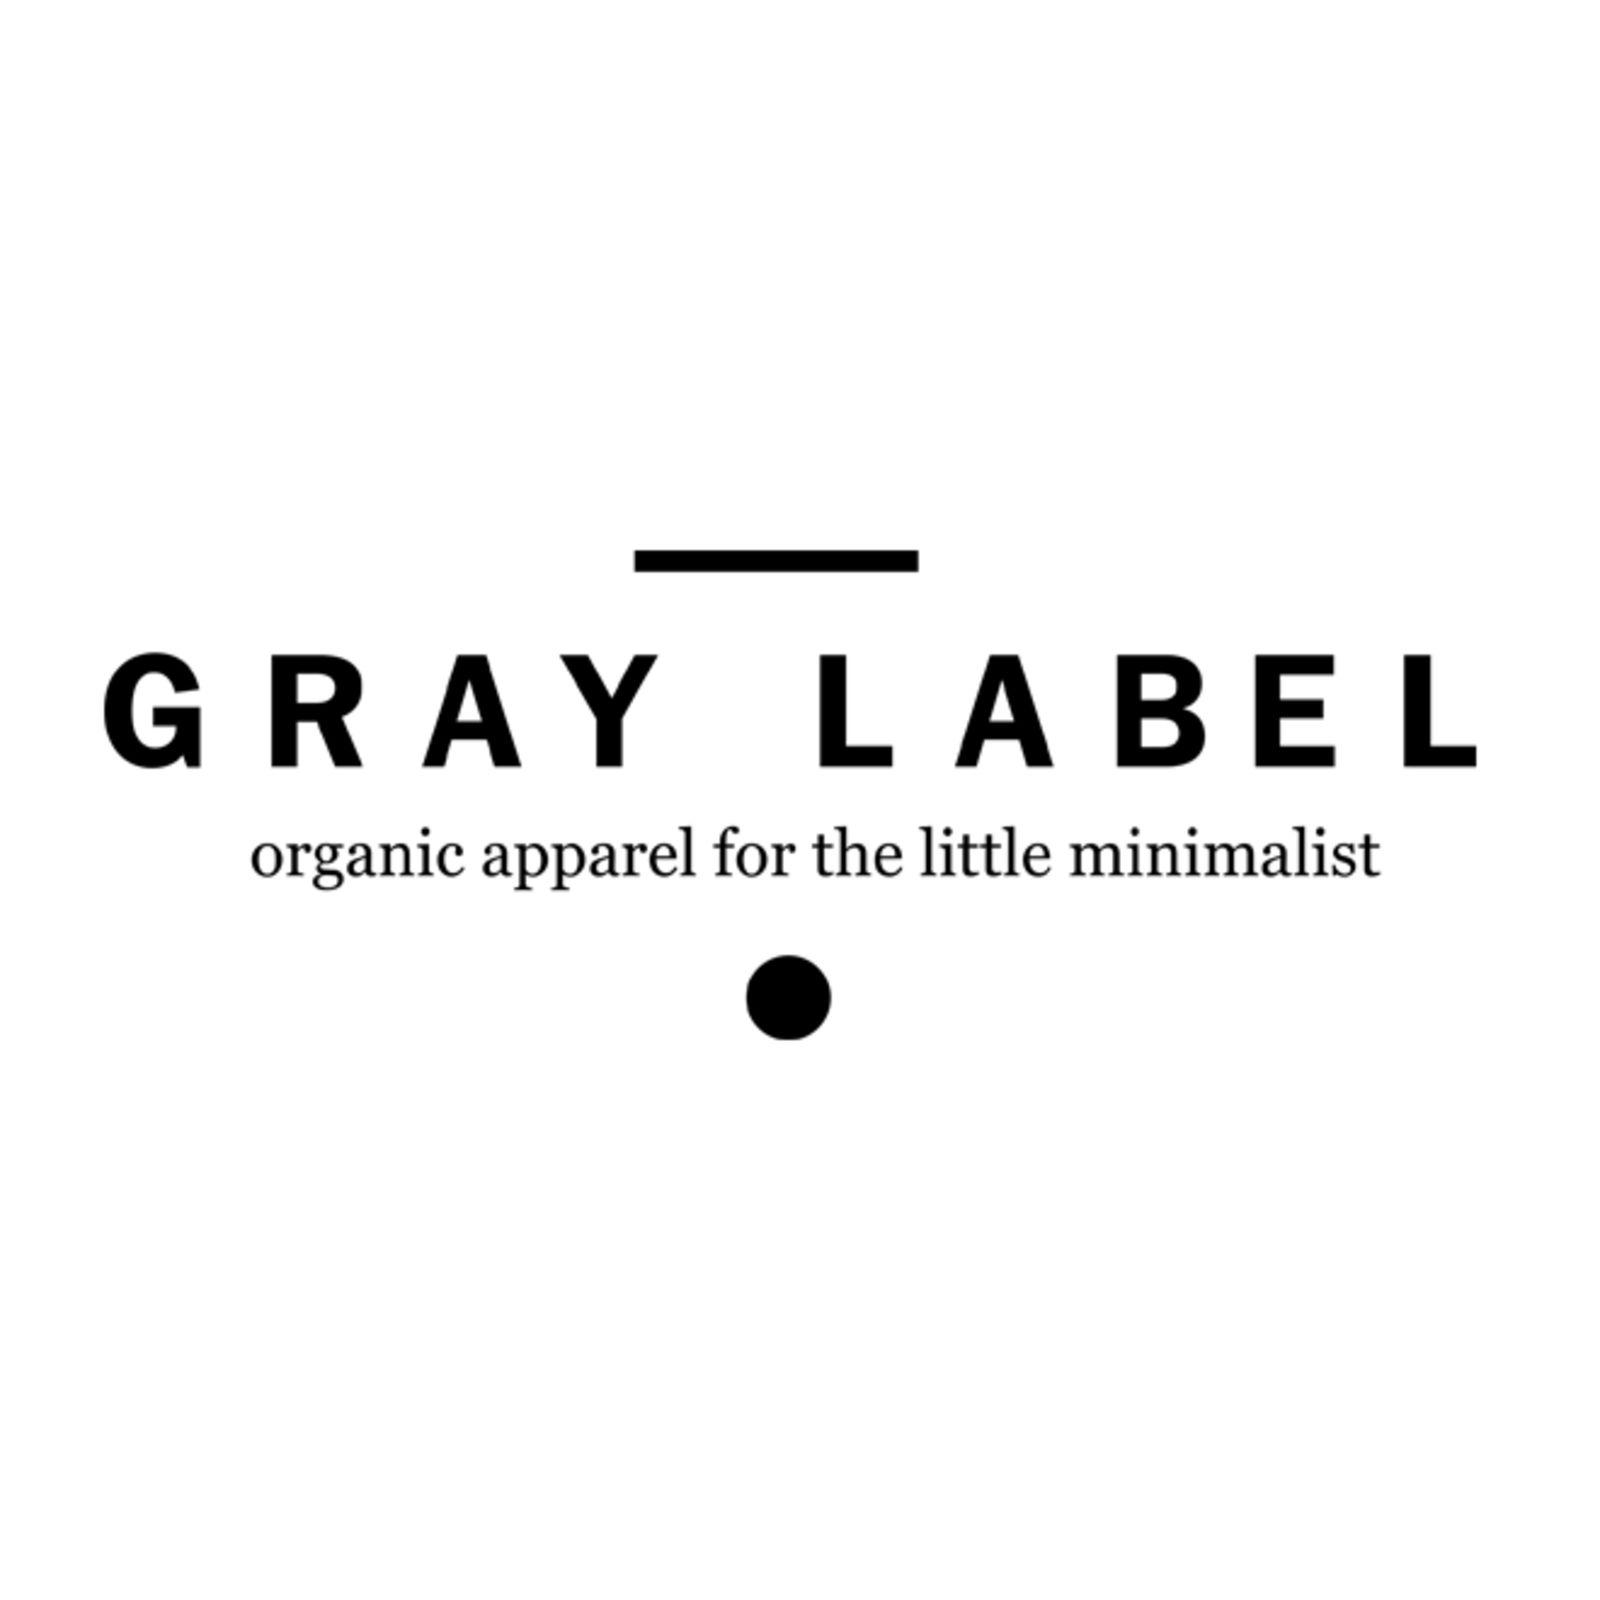 GRAY LABEL (Bild 1)